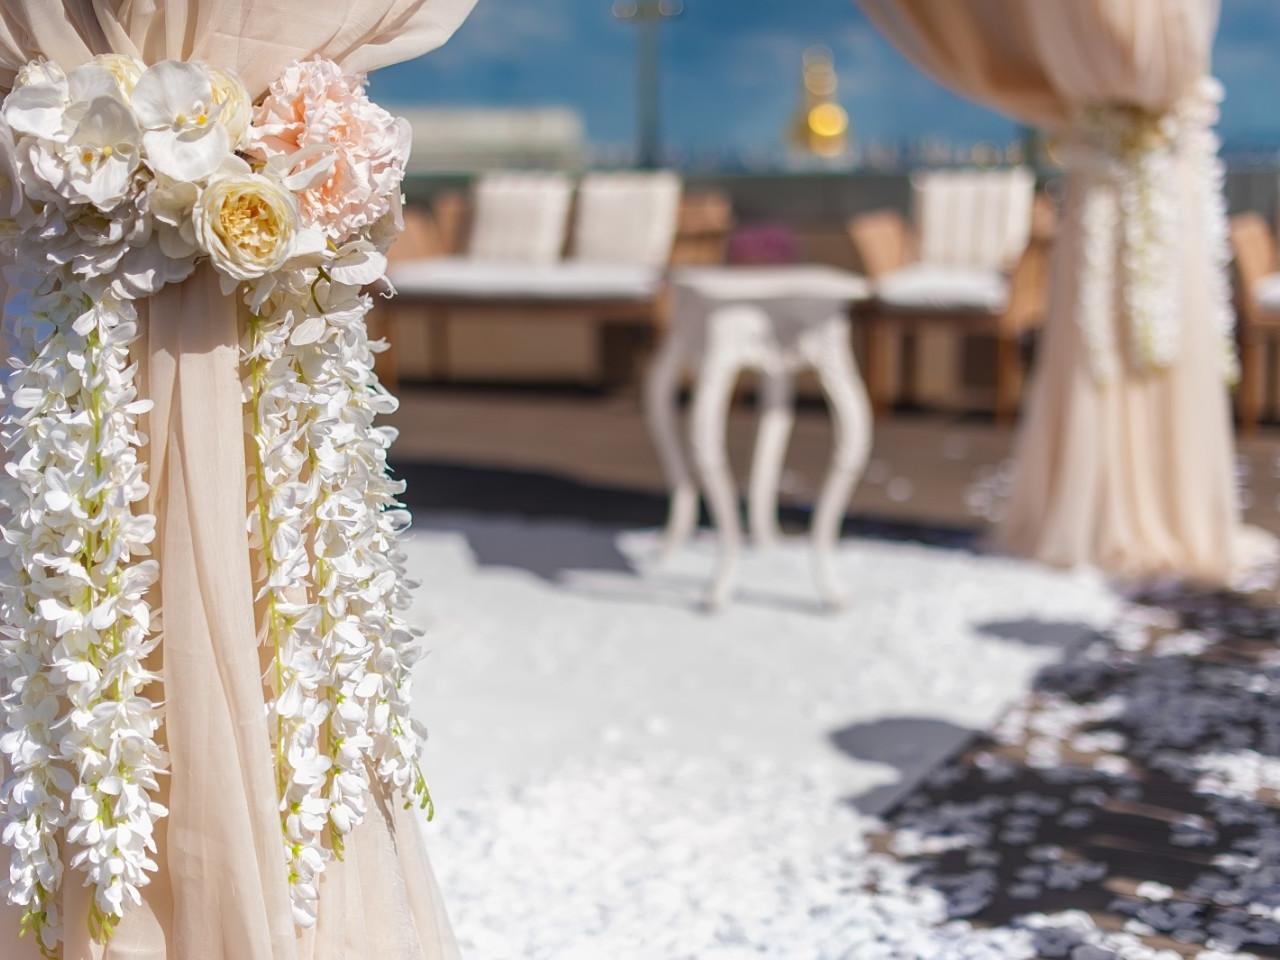 Sorrento Wedding Catering